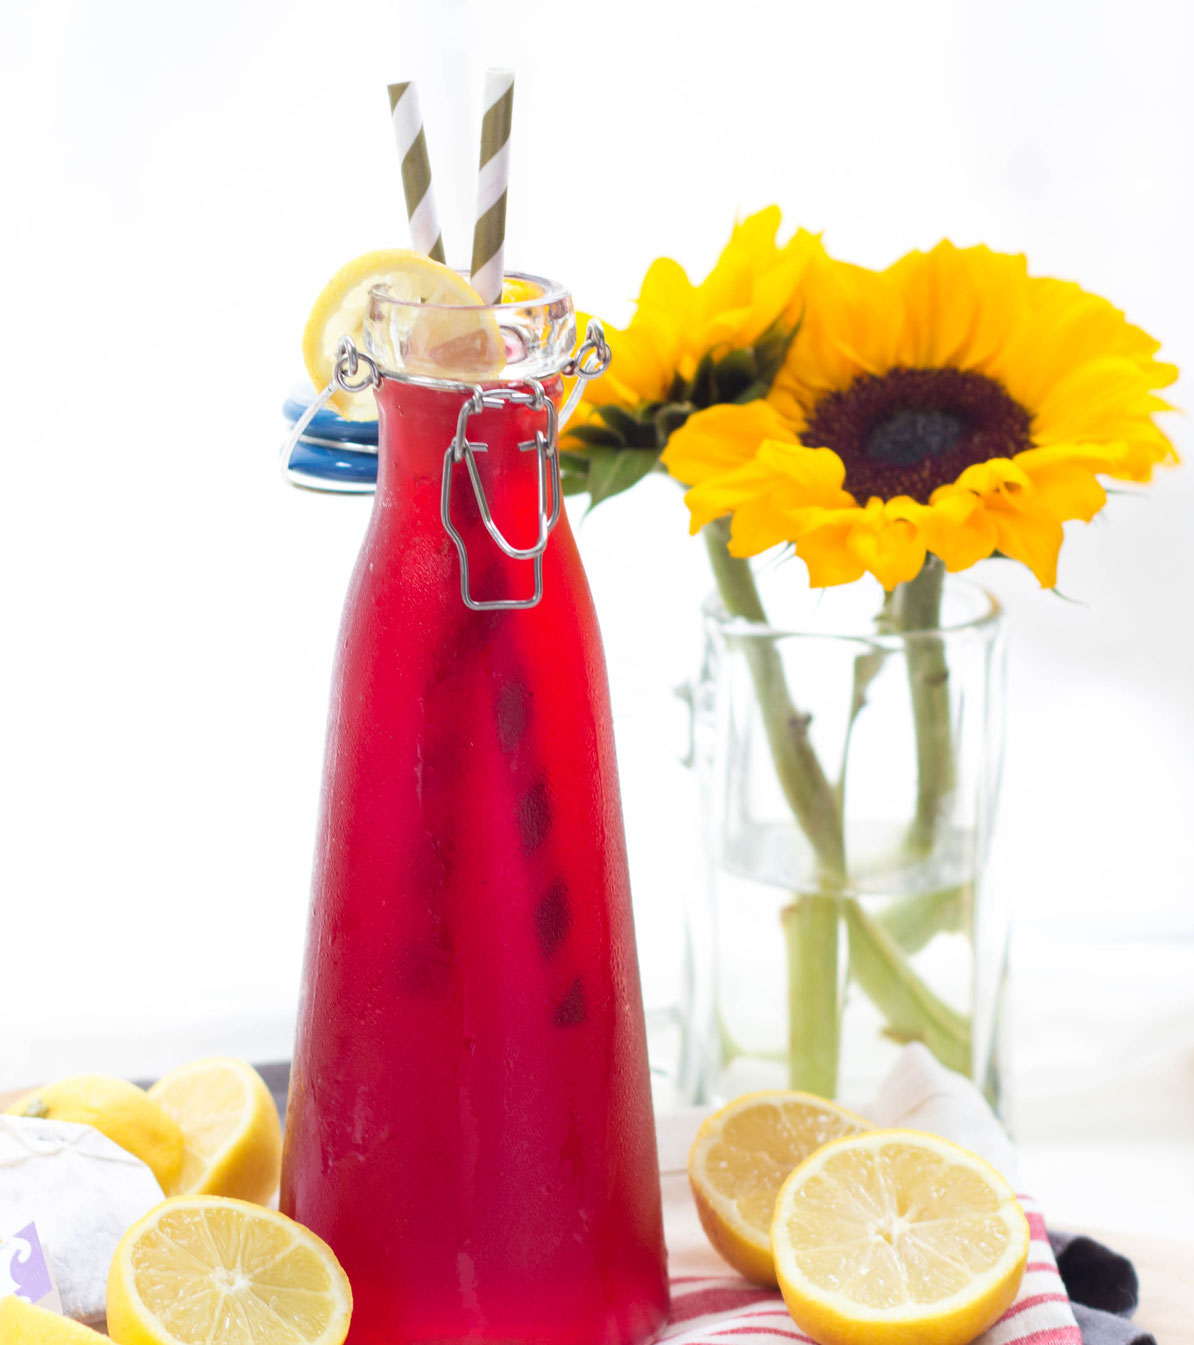 Sweet Passion Tea Lemonade - Homemade